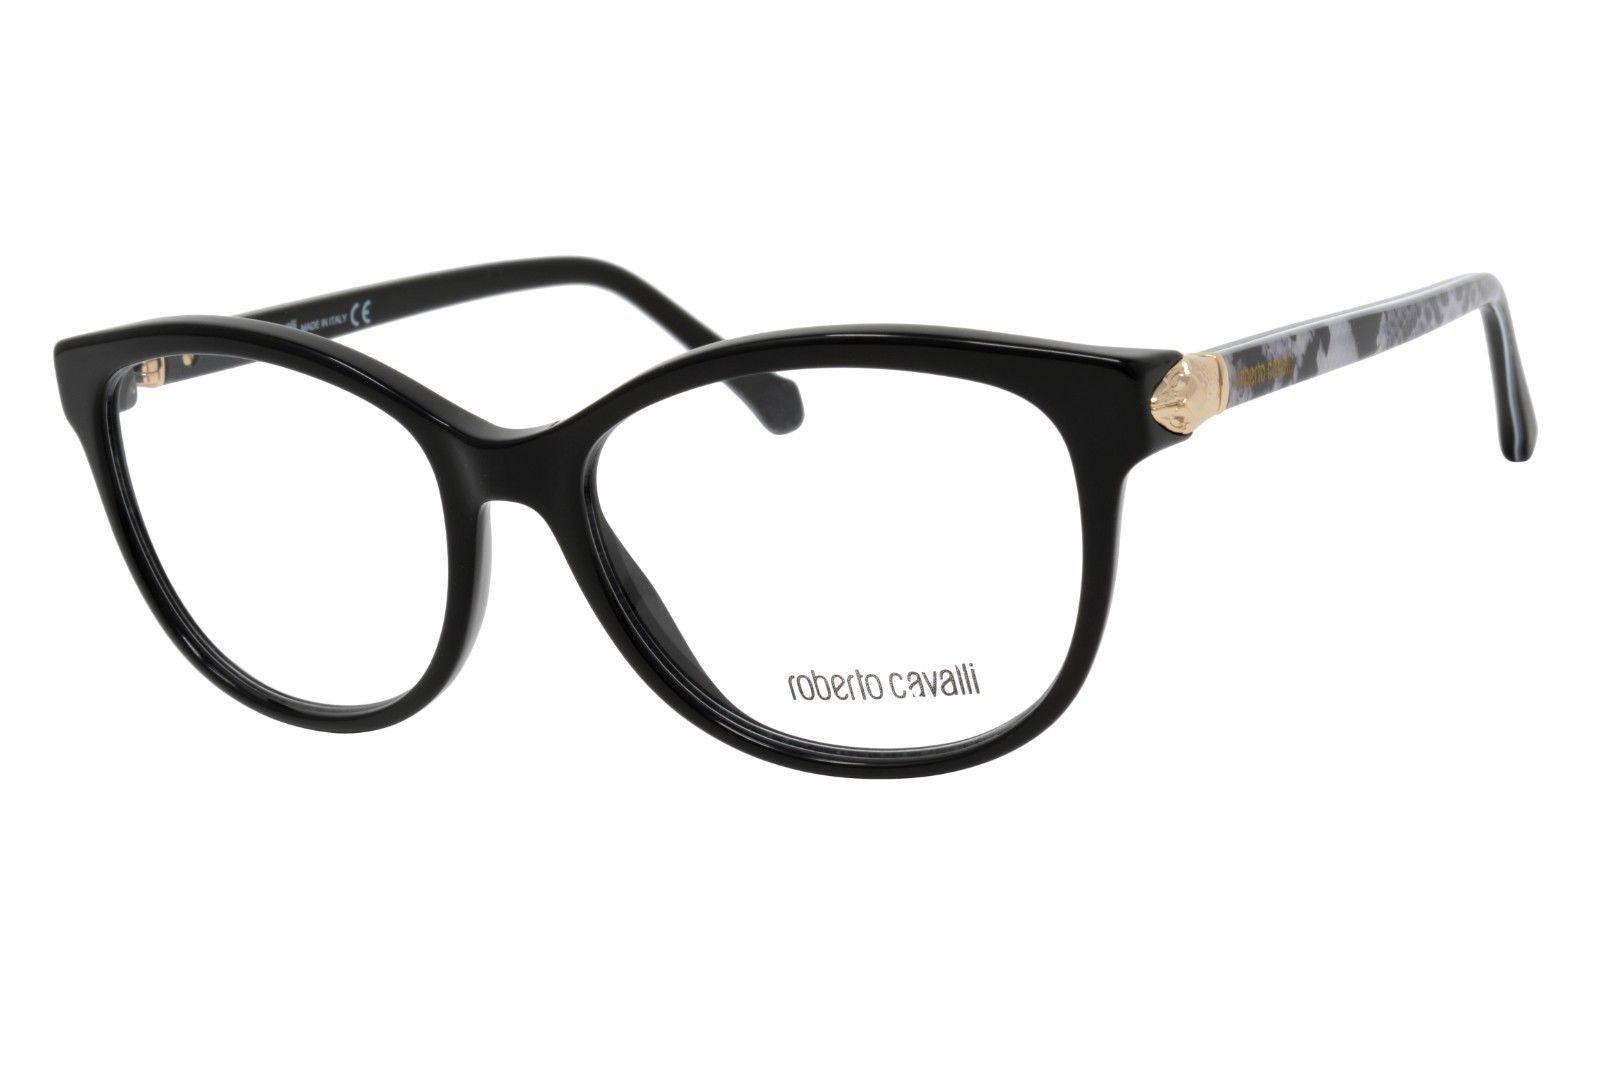 7af7f7efd93 Roberto Cavalli women s eyeglasses RAS 941 and 50 similar items. 57